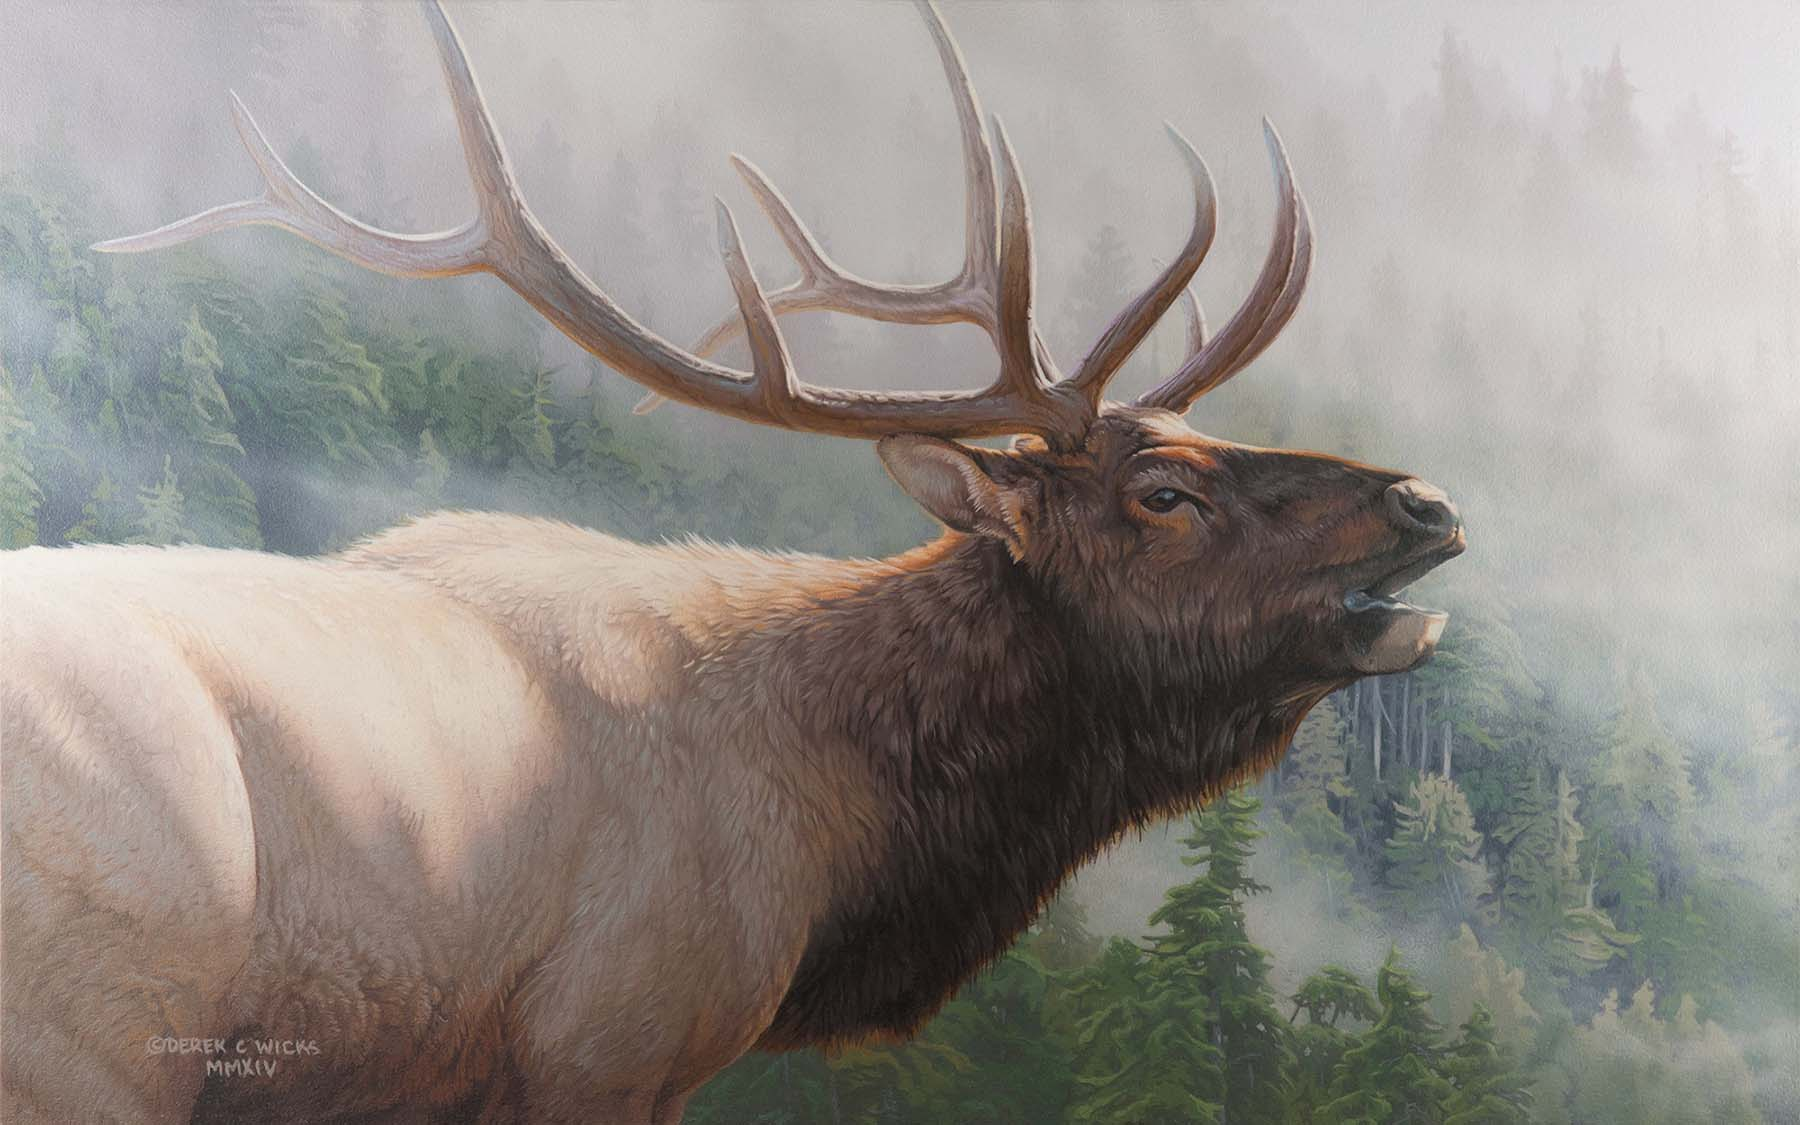 Misty Mountain Challenge - Derek Wicks